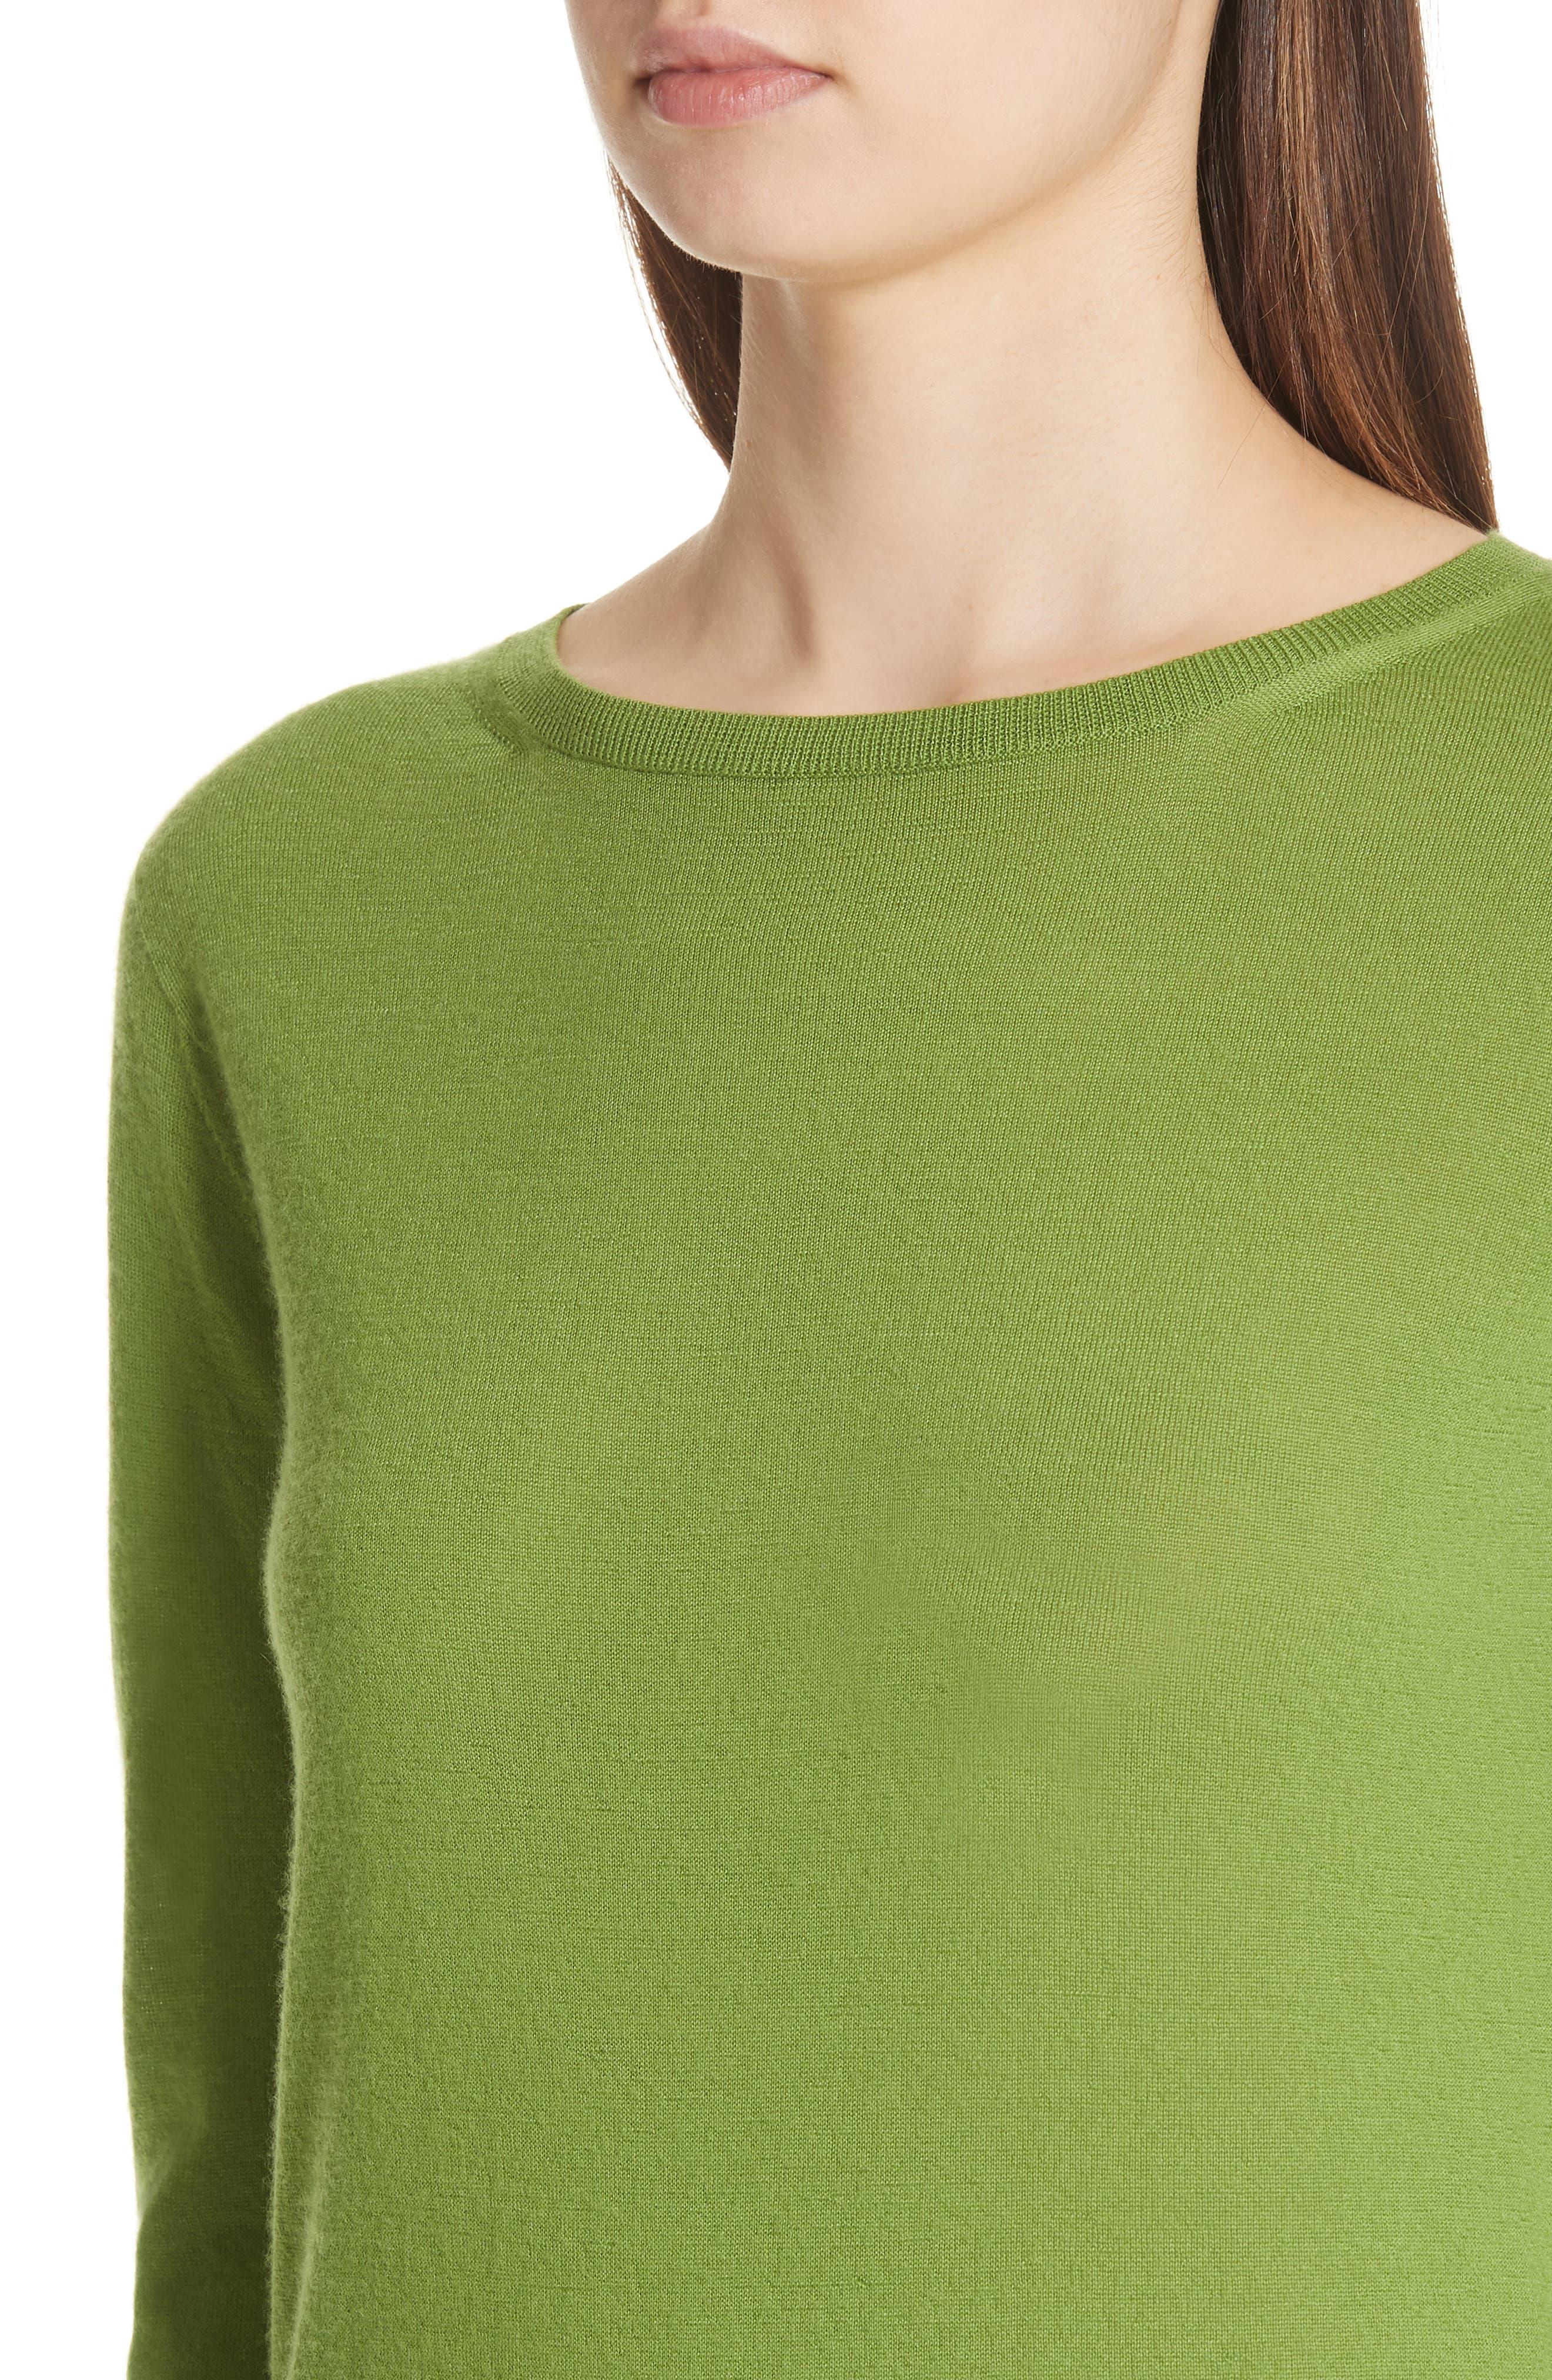 MAX MARA,                             Charles Cashmere Sweater,                             Alternate thumbnail 4, color,                             314